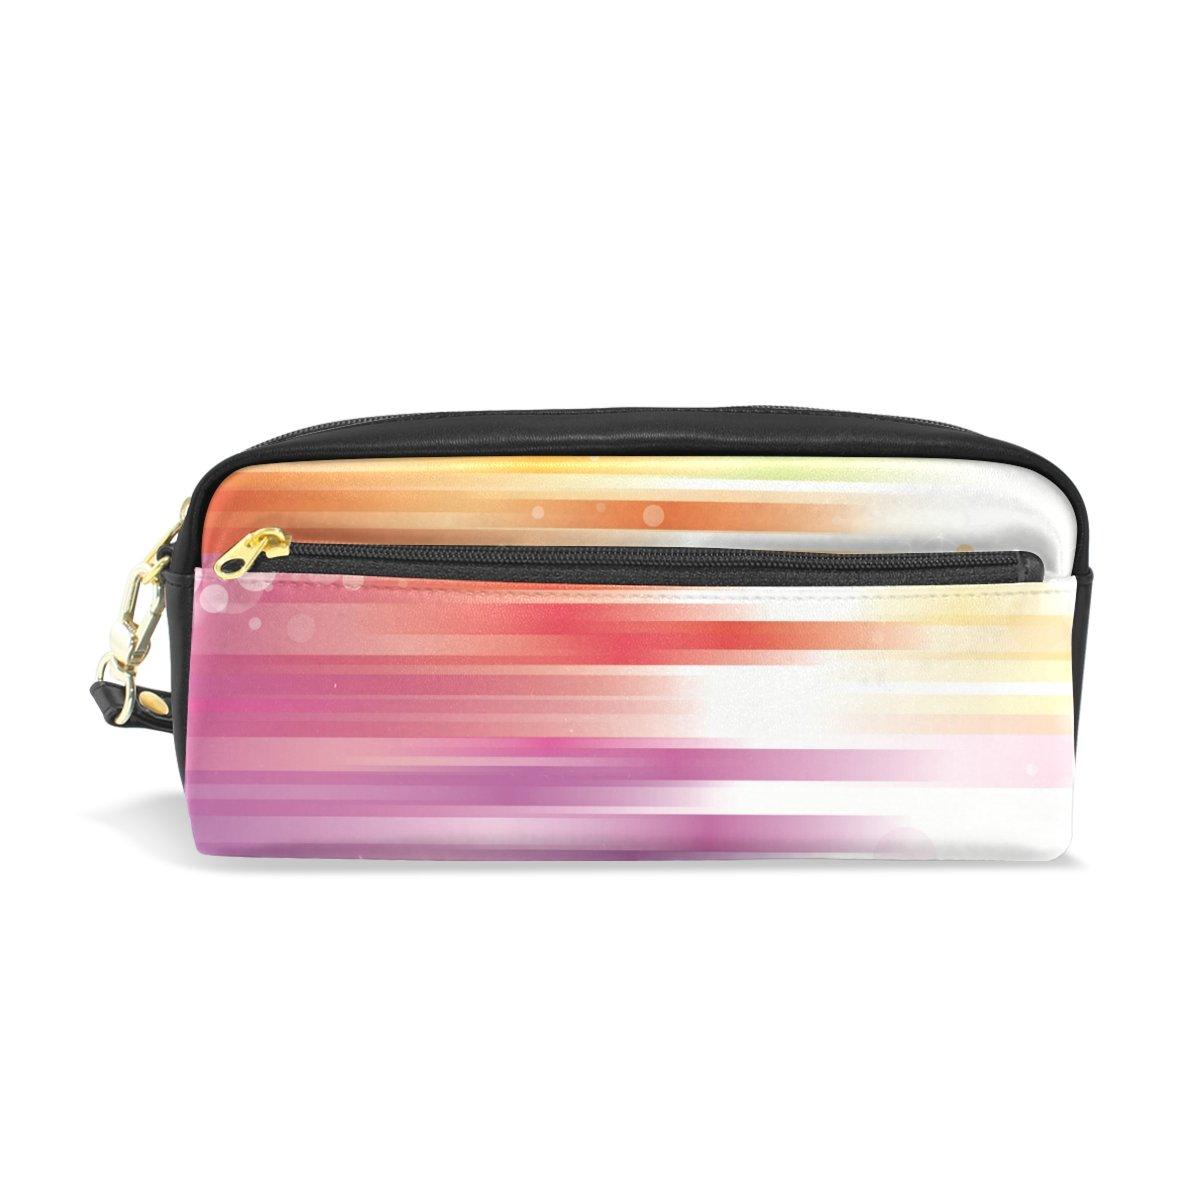 BENNIGIRY Regenbogenfarbe Bleistift Fall tragbar Pen Tasche Student Schreibwaren Pouch PU Leder Groß Kapazität Reißverschluss Make-up Kosmetiktasche B079NNJWT1     | Billig ideal